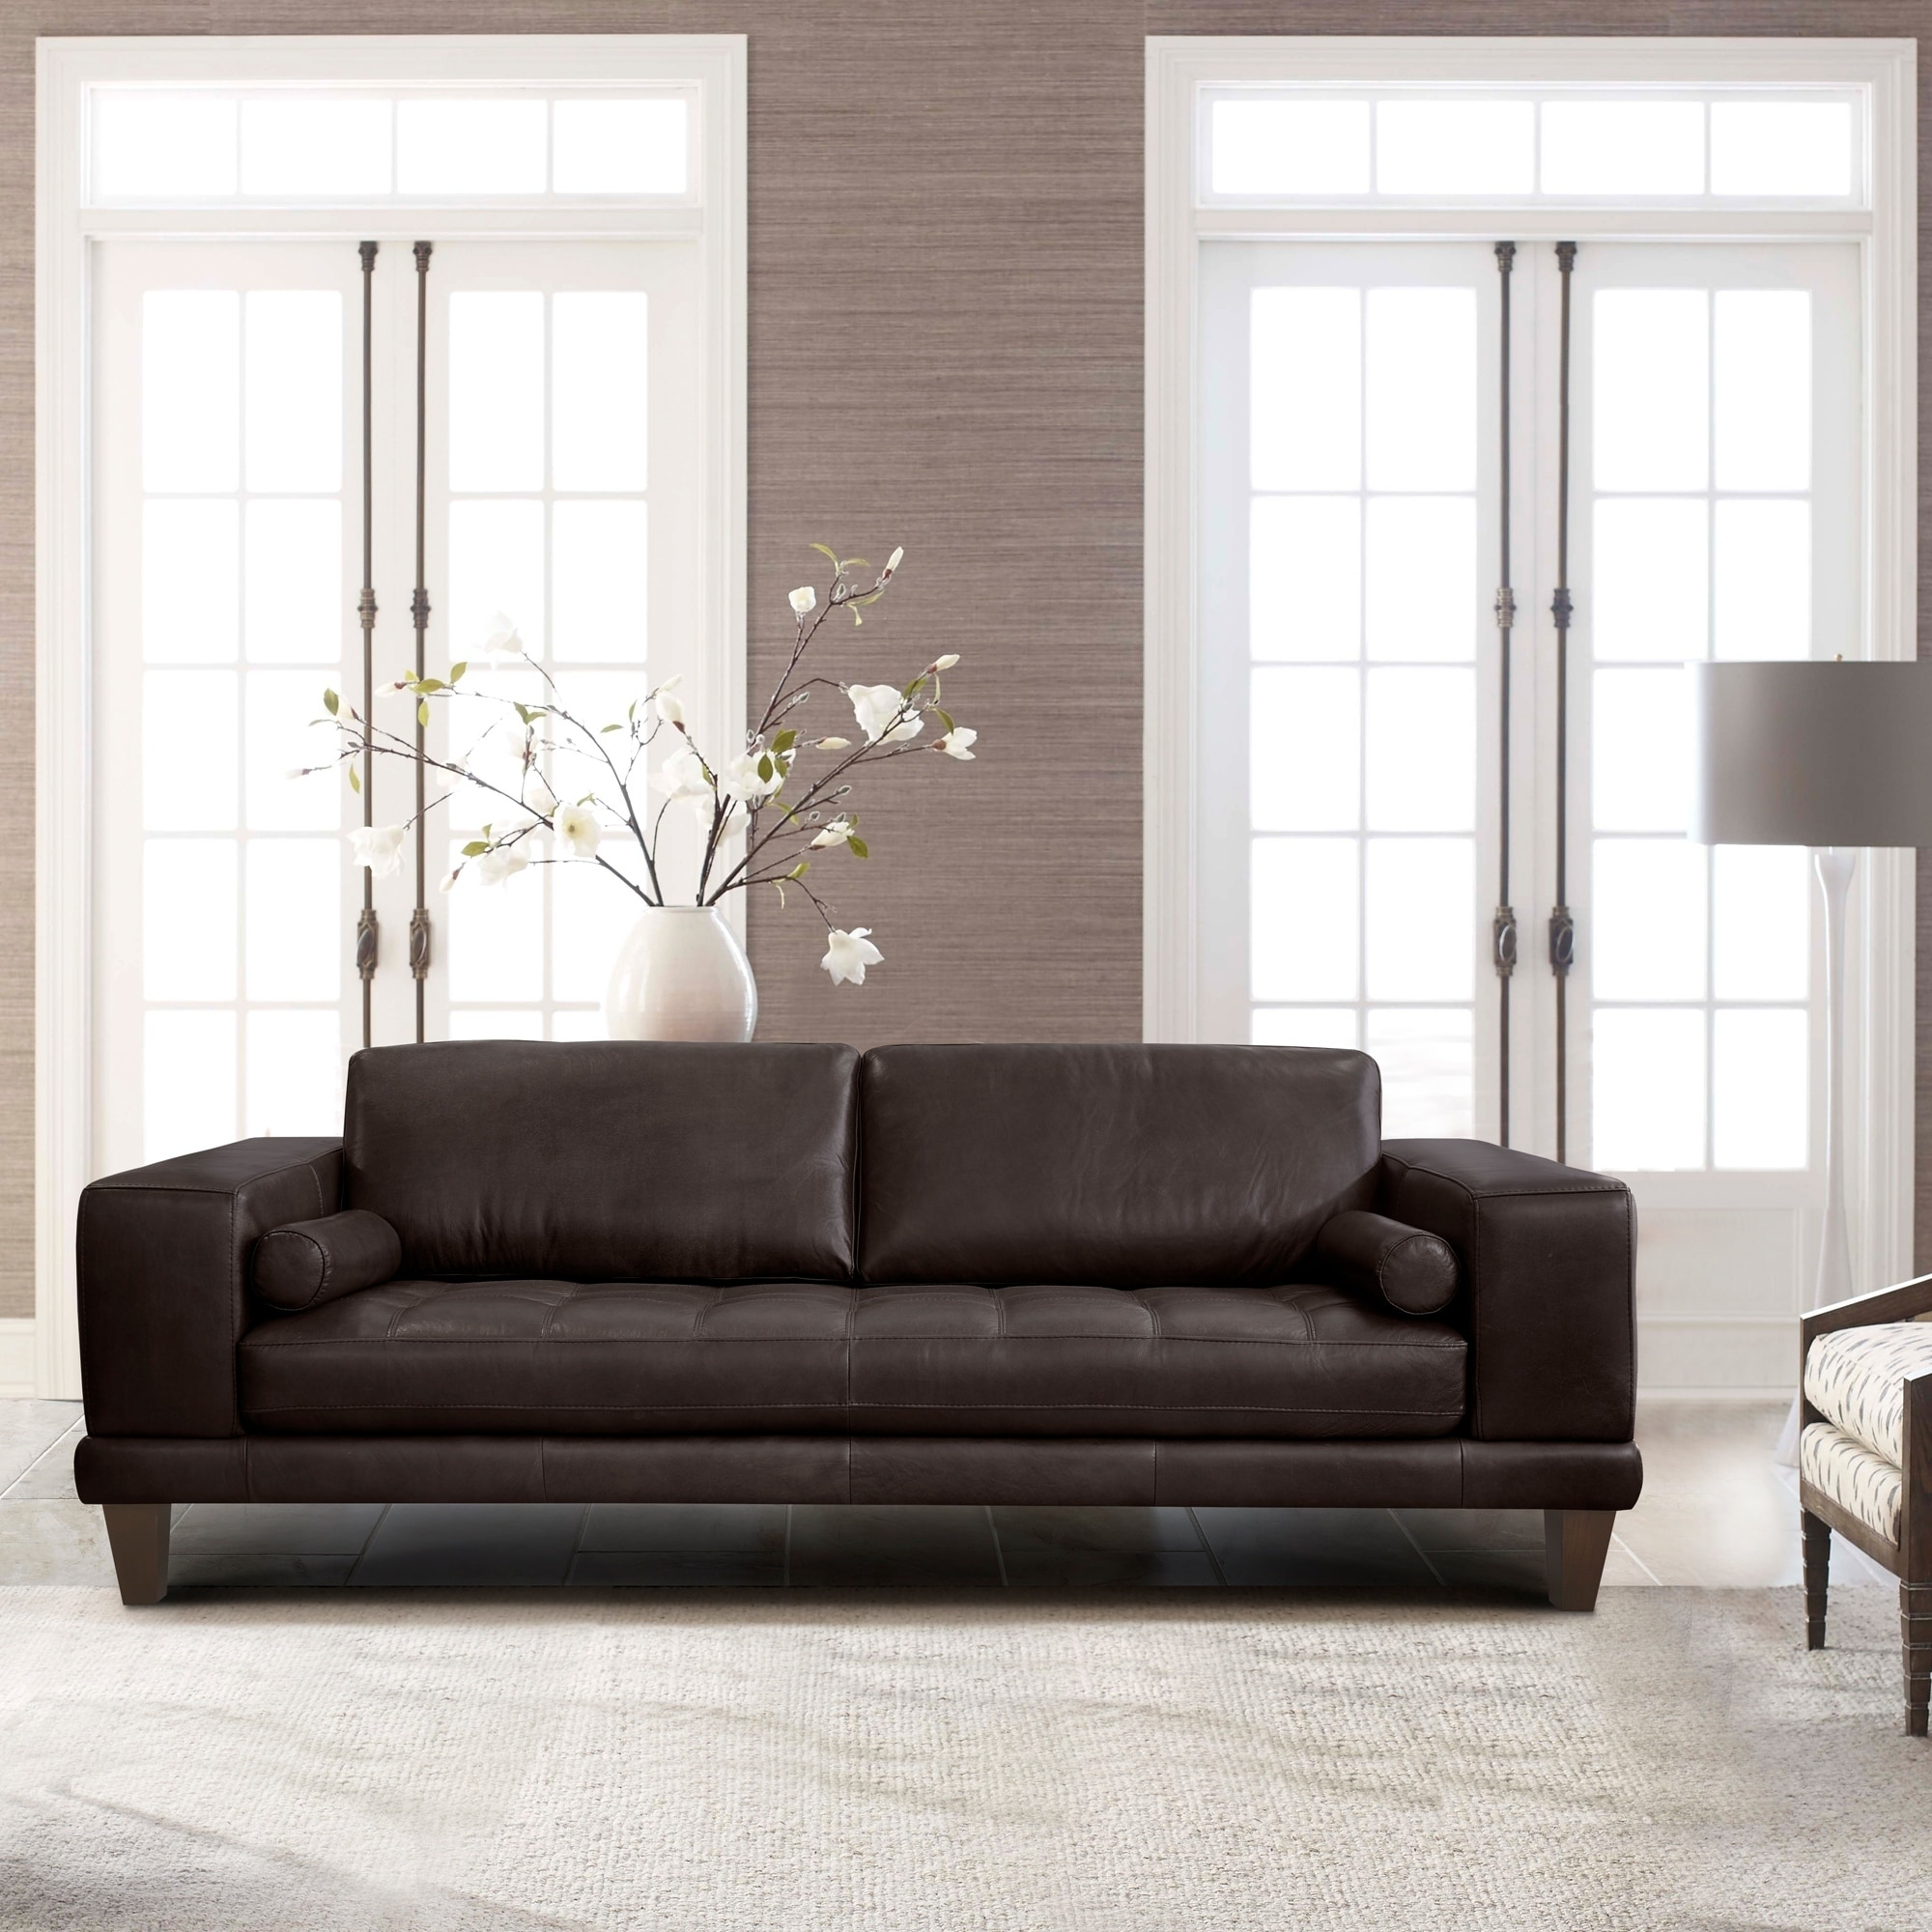 Shop Armen Living Wynne Contemporary Sofa in Genuine Espresso ...